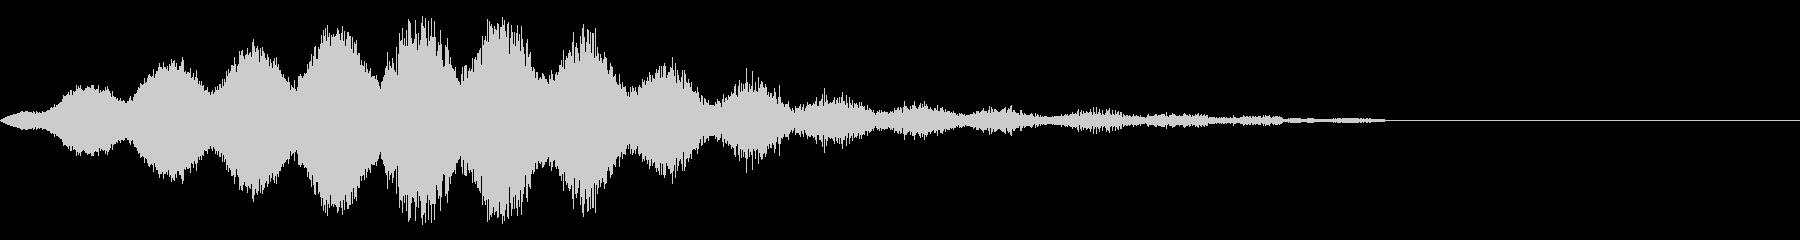 SF、ワープ、シュワシュワ系の未再生の波形